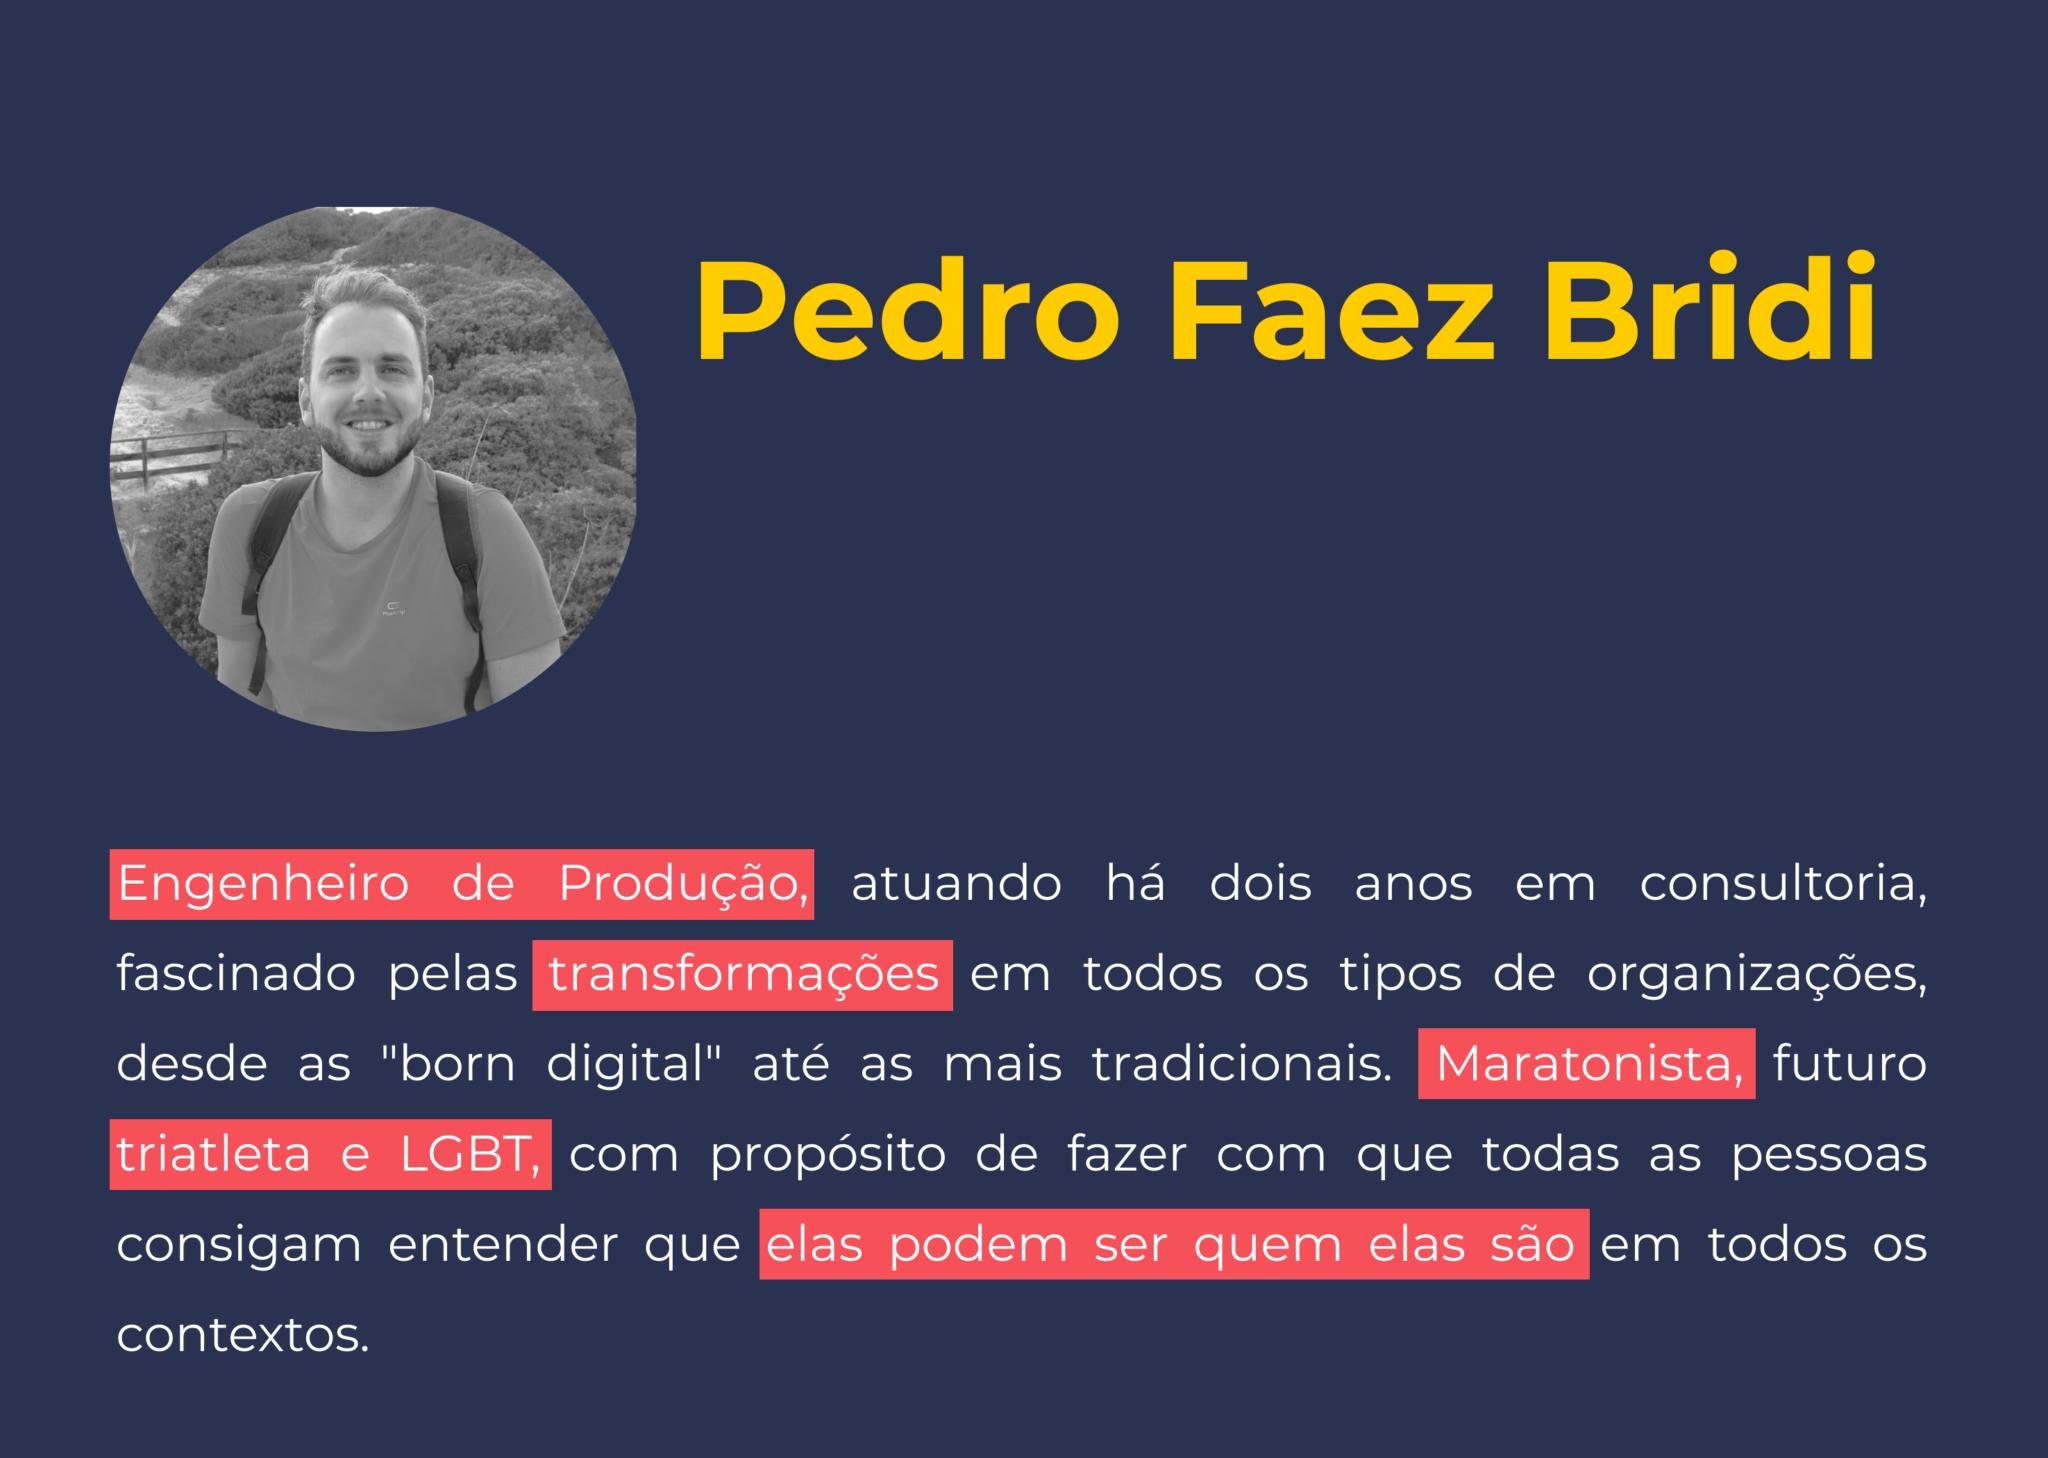 Pedro Faez Bridi_minibio